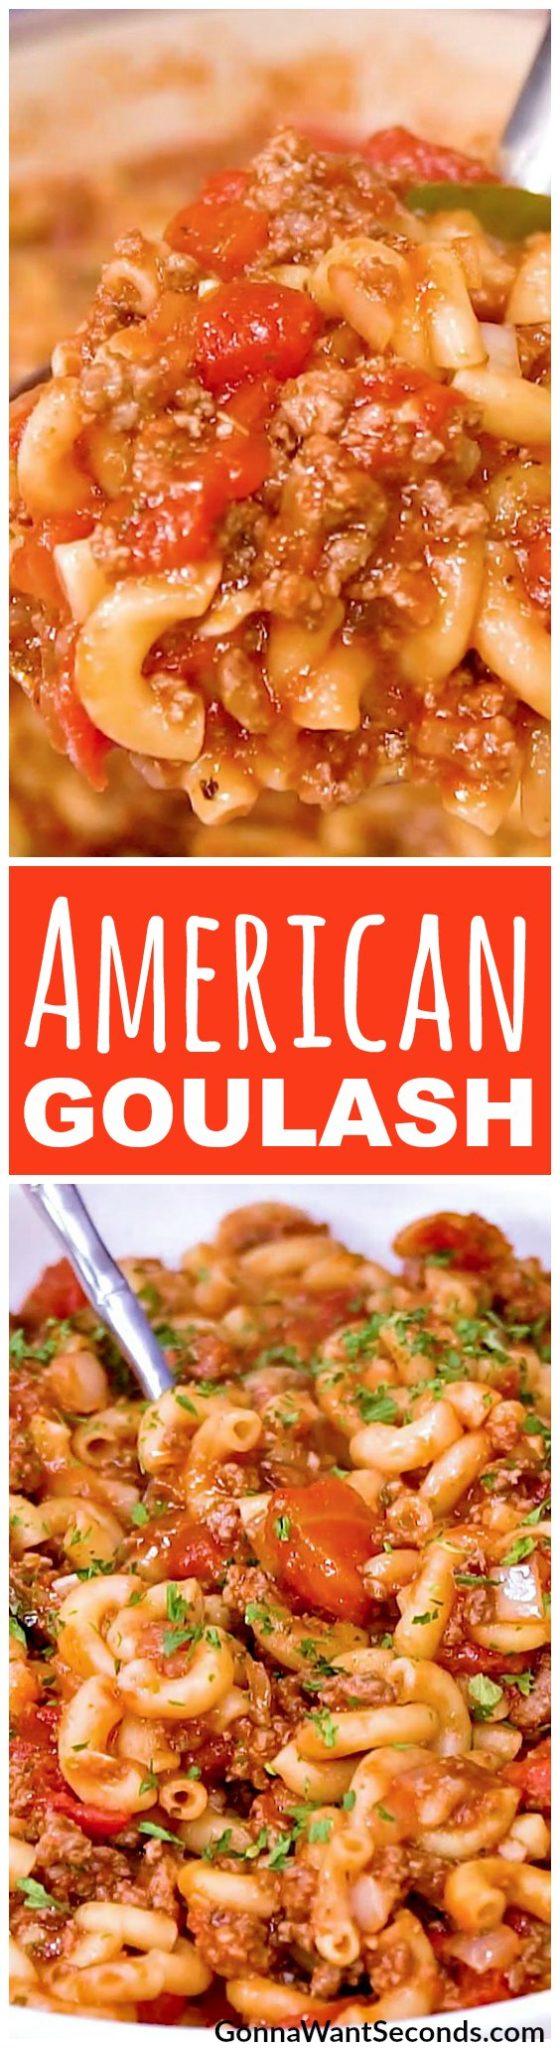 American-Goulash